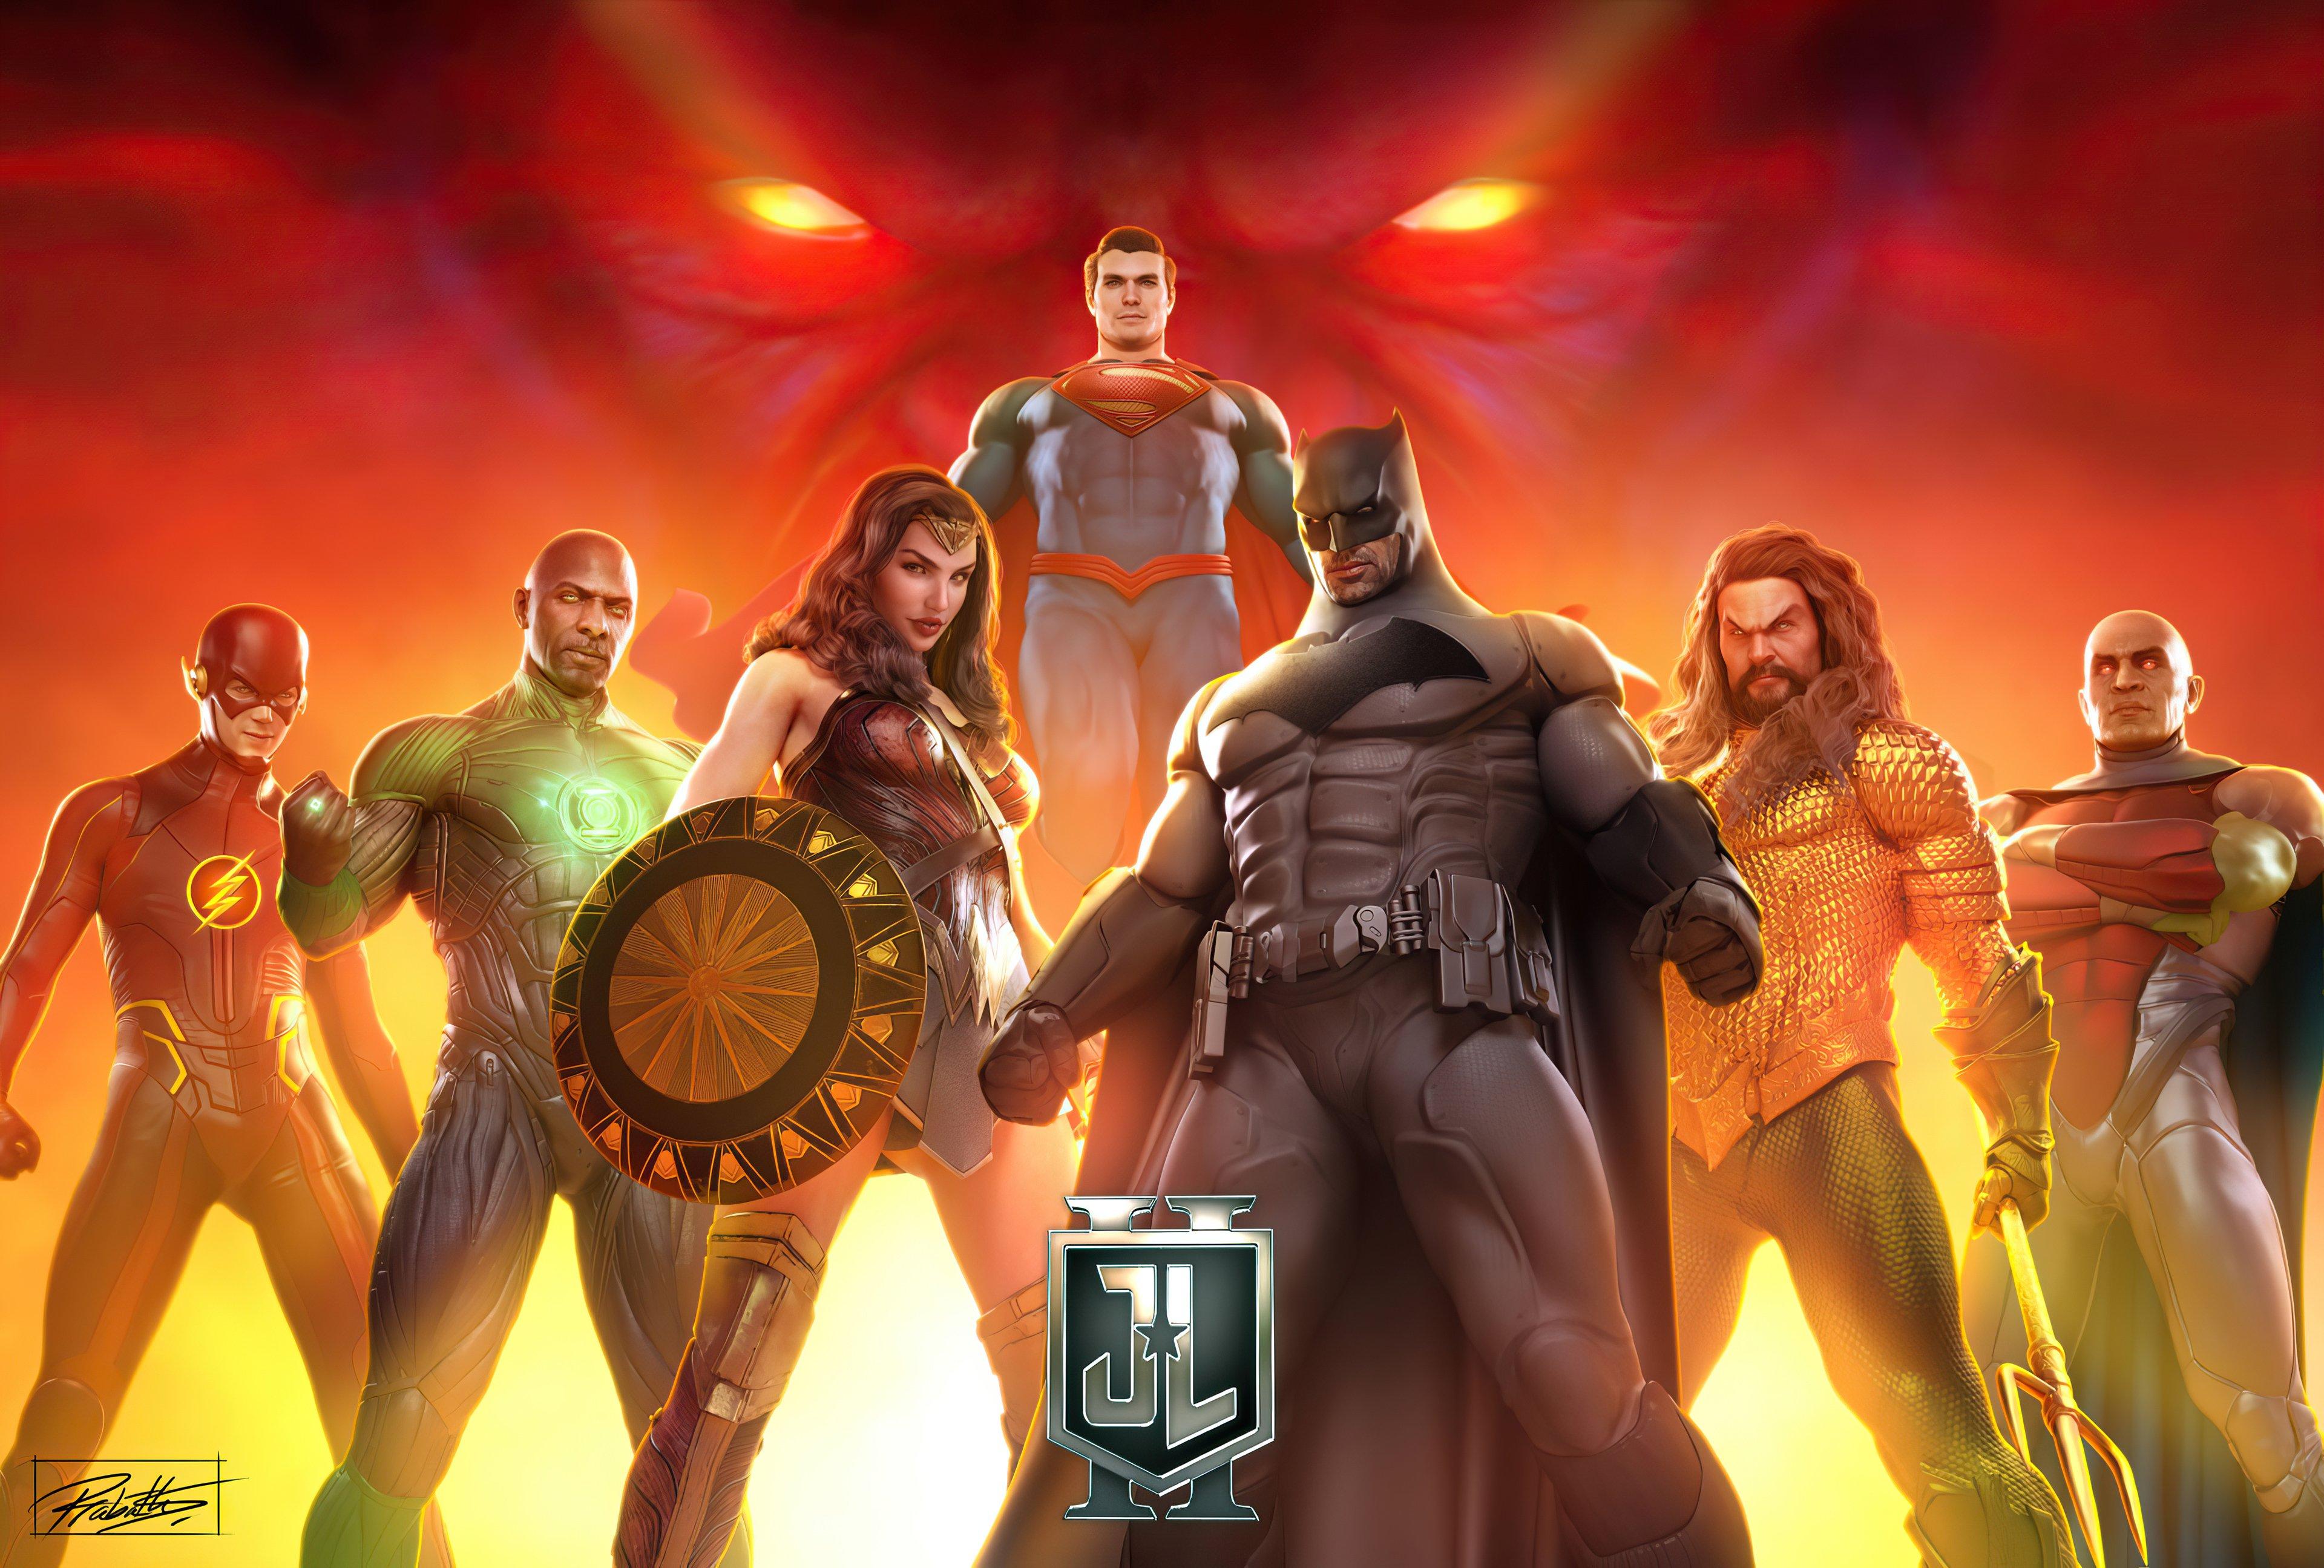 Fondos de pantalla Superheroes de Liga de la Justicia